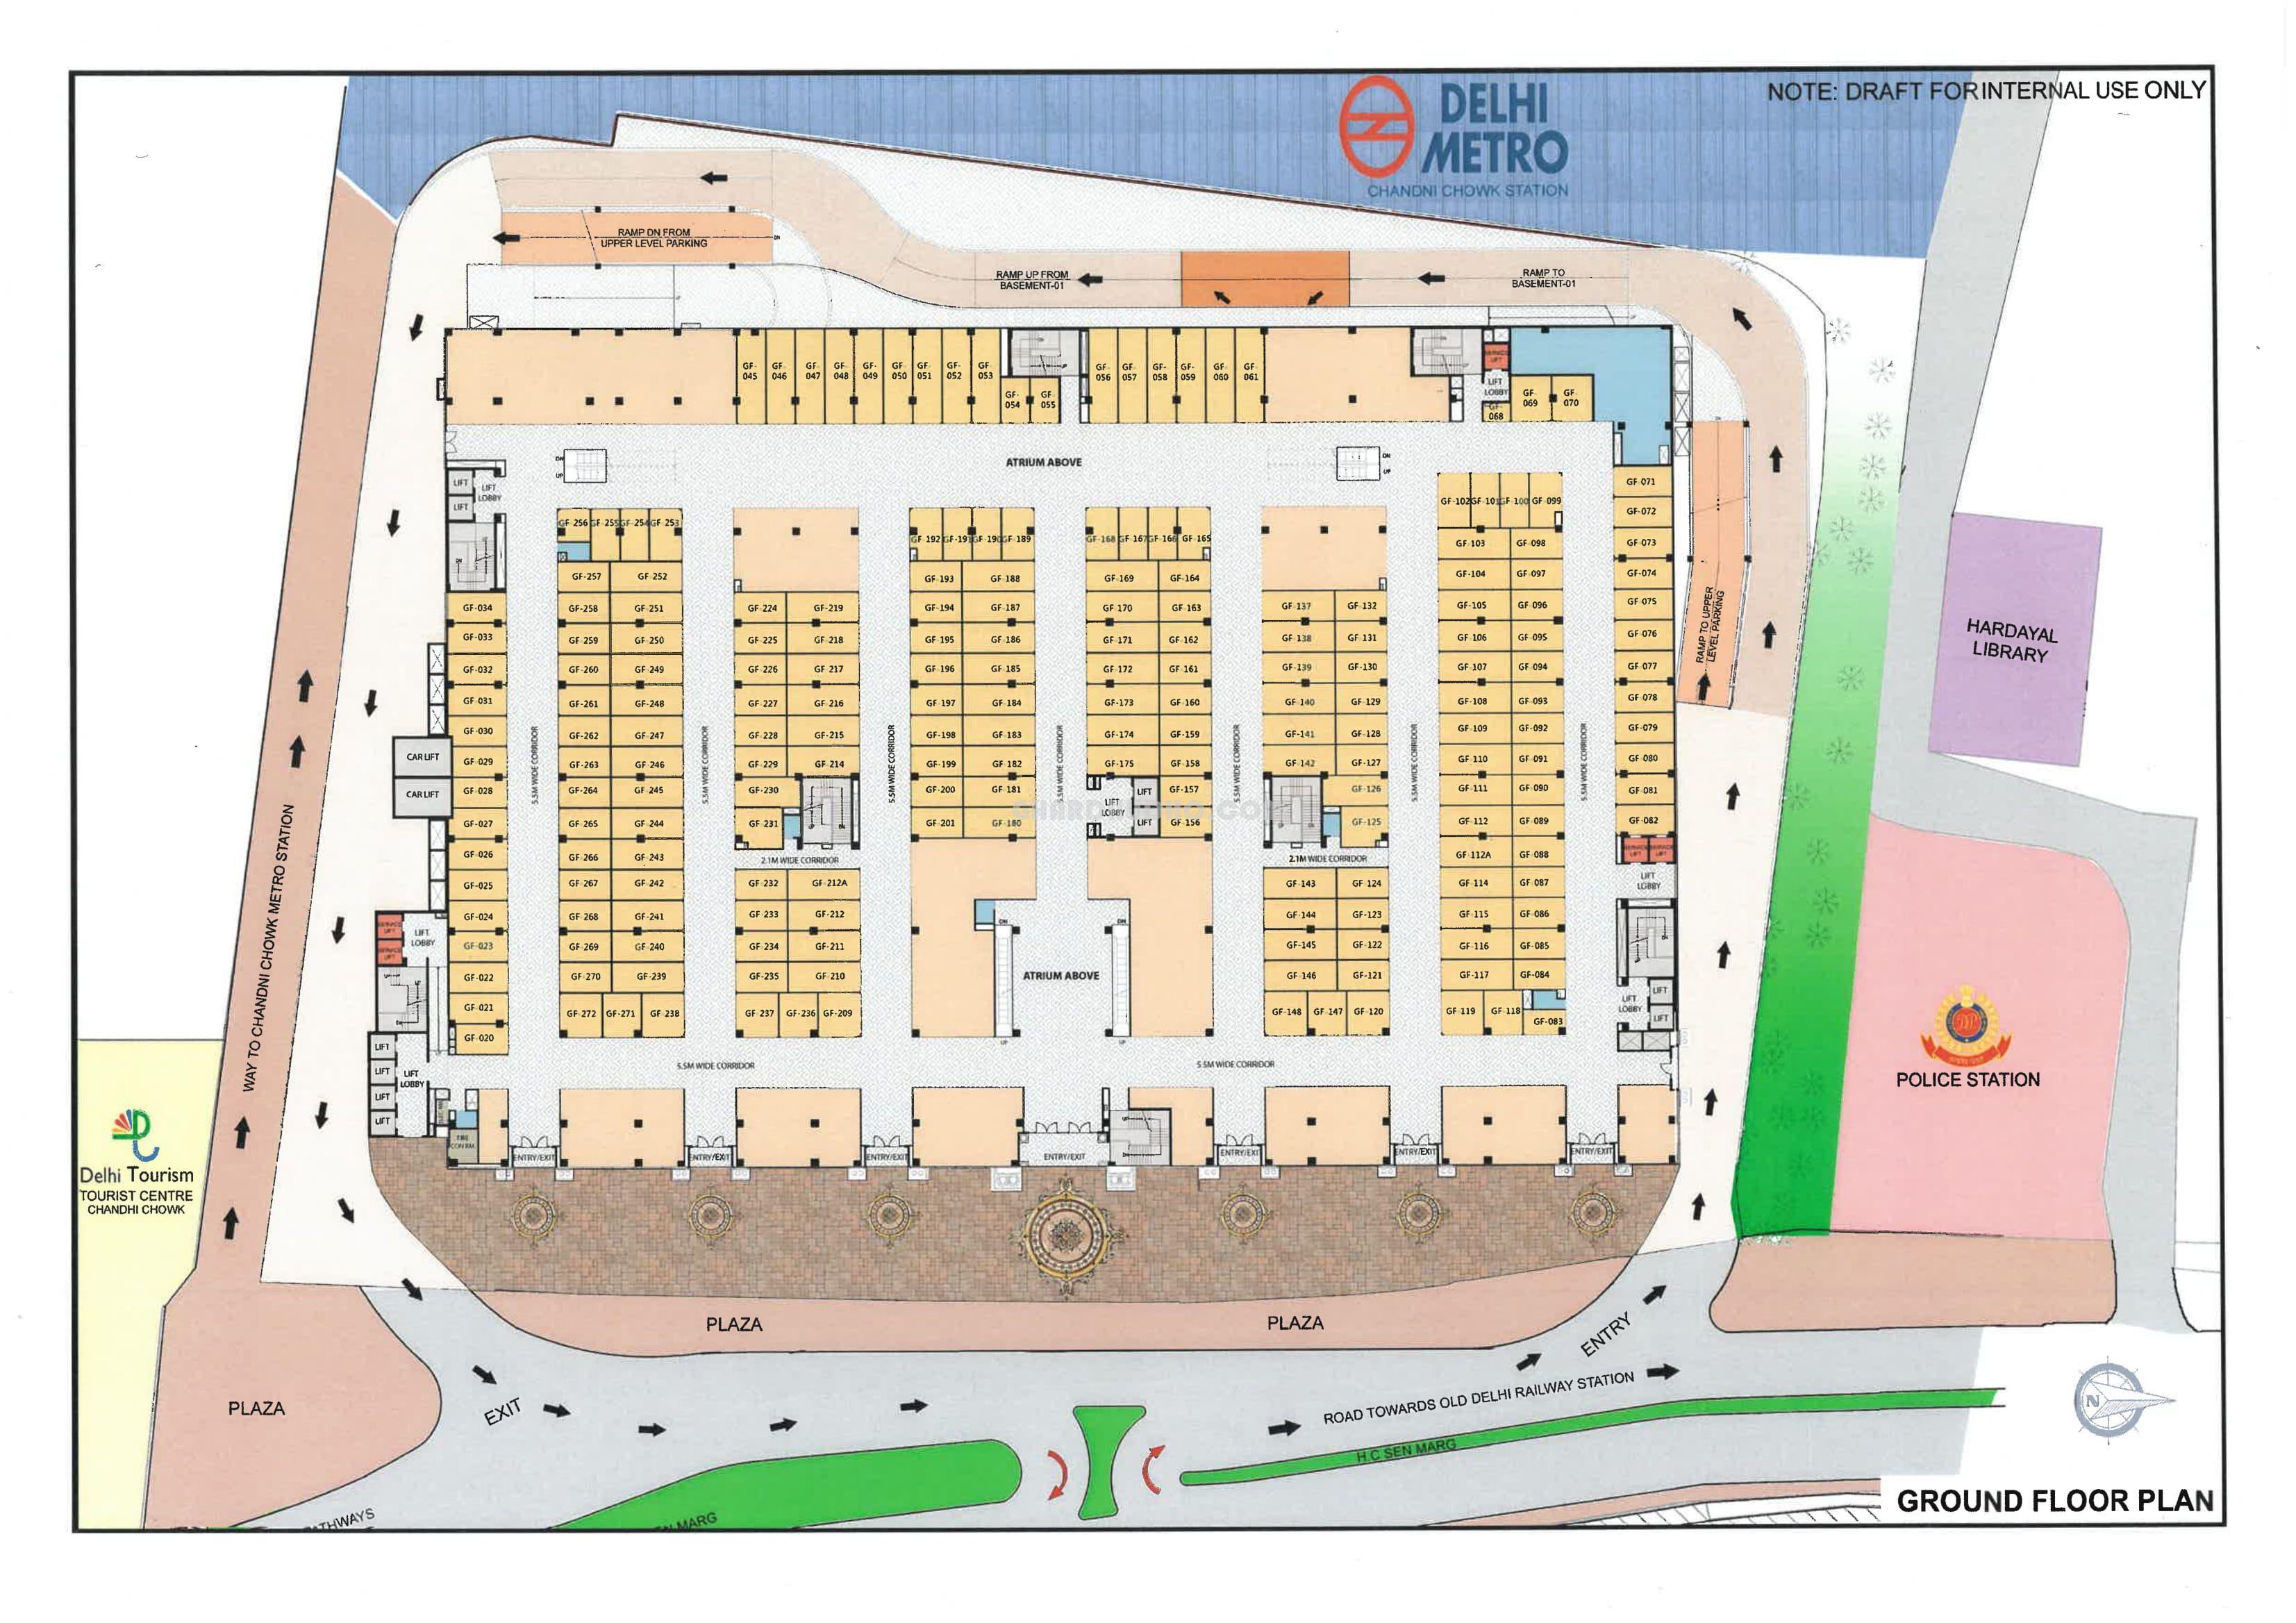 Proposed_Ground_Floor_Plans-2.jpg